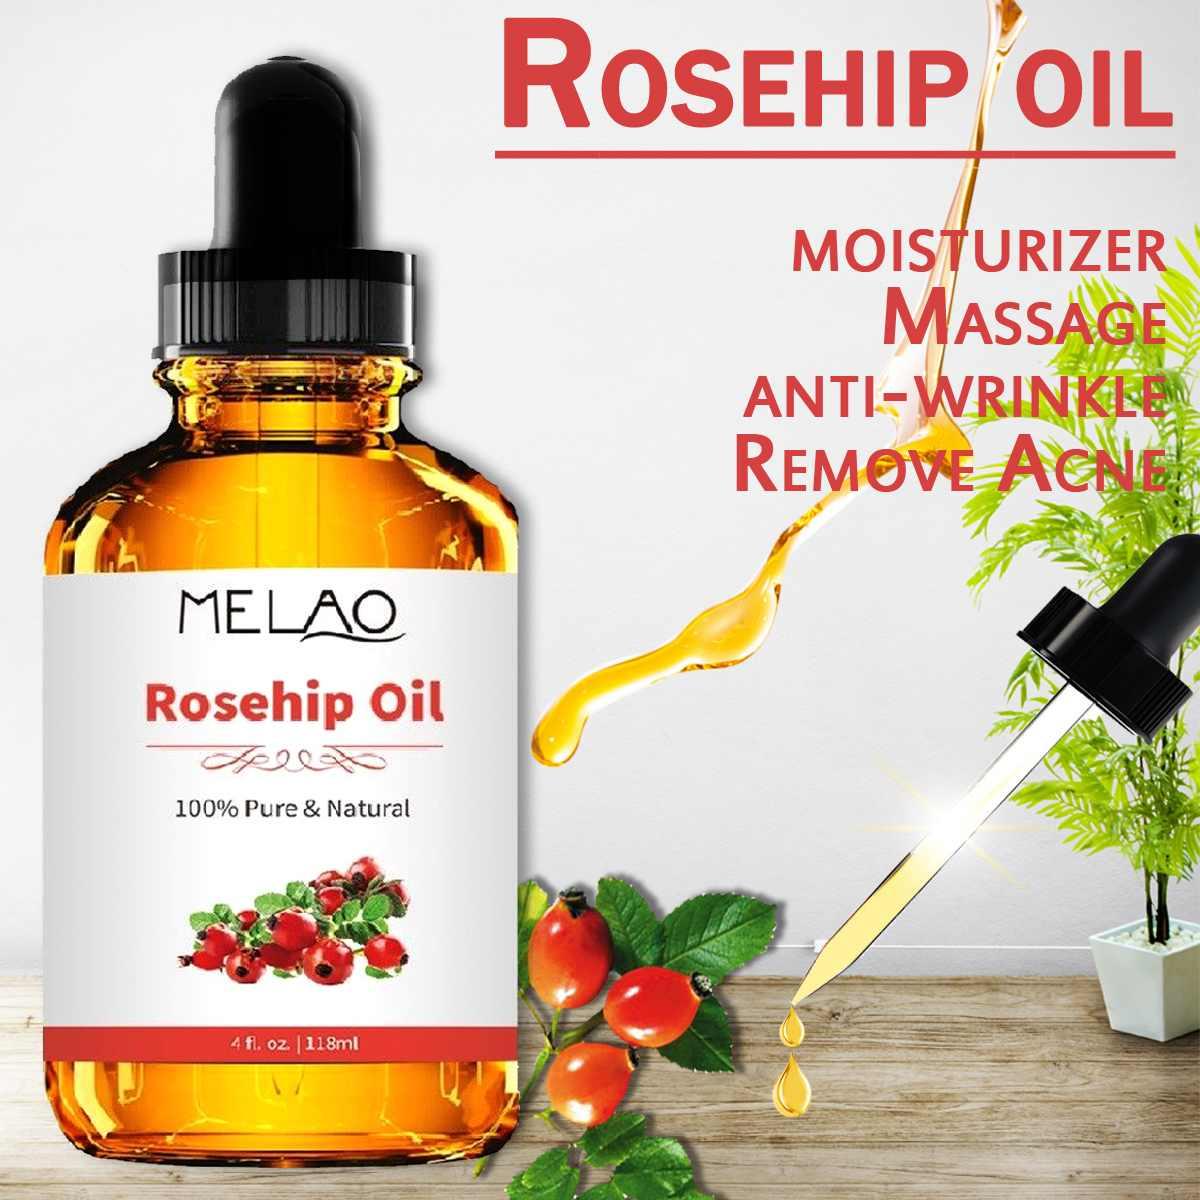 118ml Organic Pure 100% Rosehip Essential Oil Pure Rose Essential Oil Skin Care Body or Face Massage Oil118ml Organic Pure 100% Rosehip Essential Oil Pure Rose Essential Oil Skin Care Body or Face Massage Oil